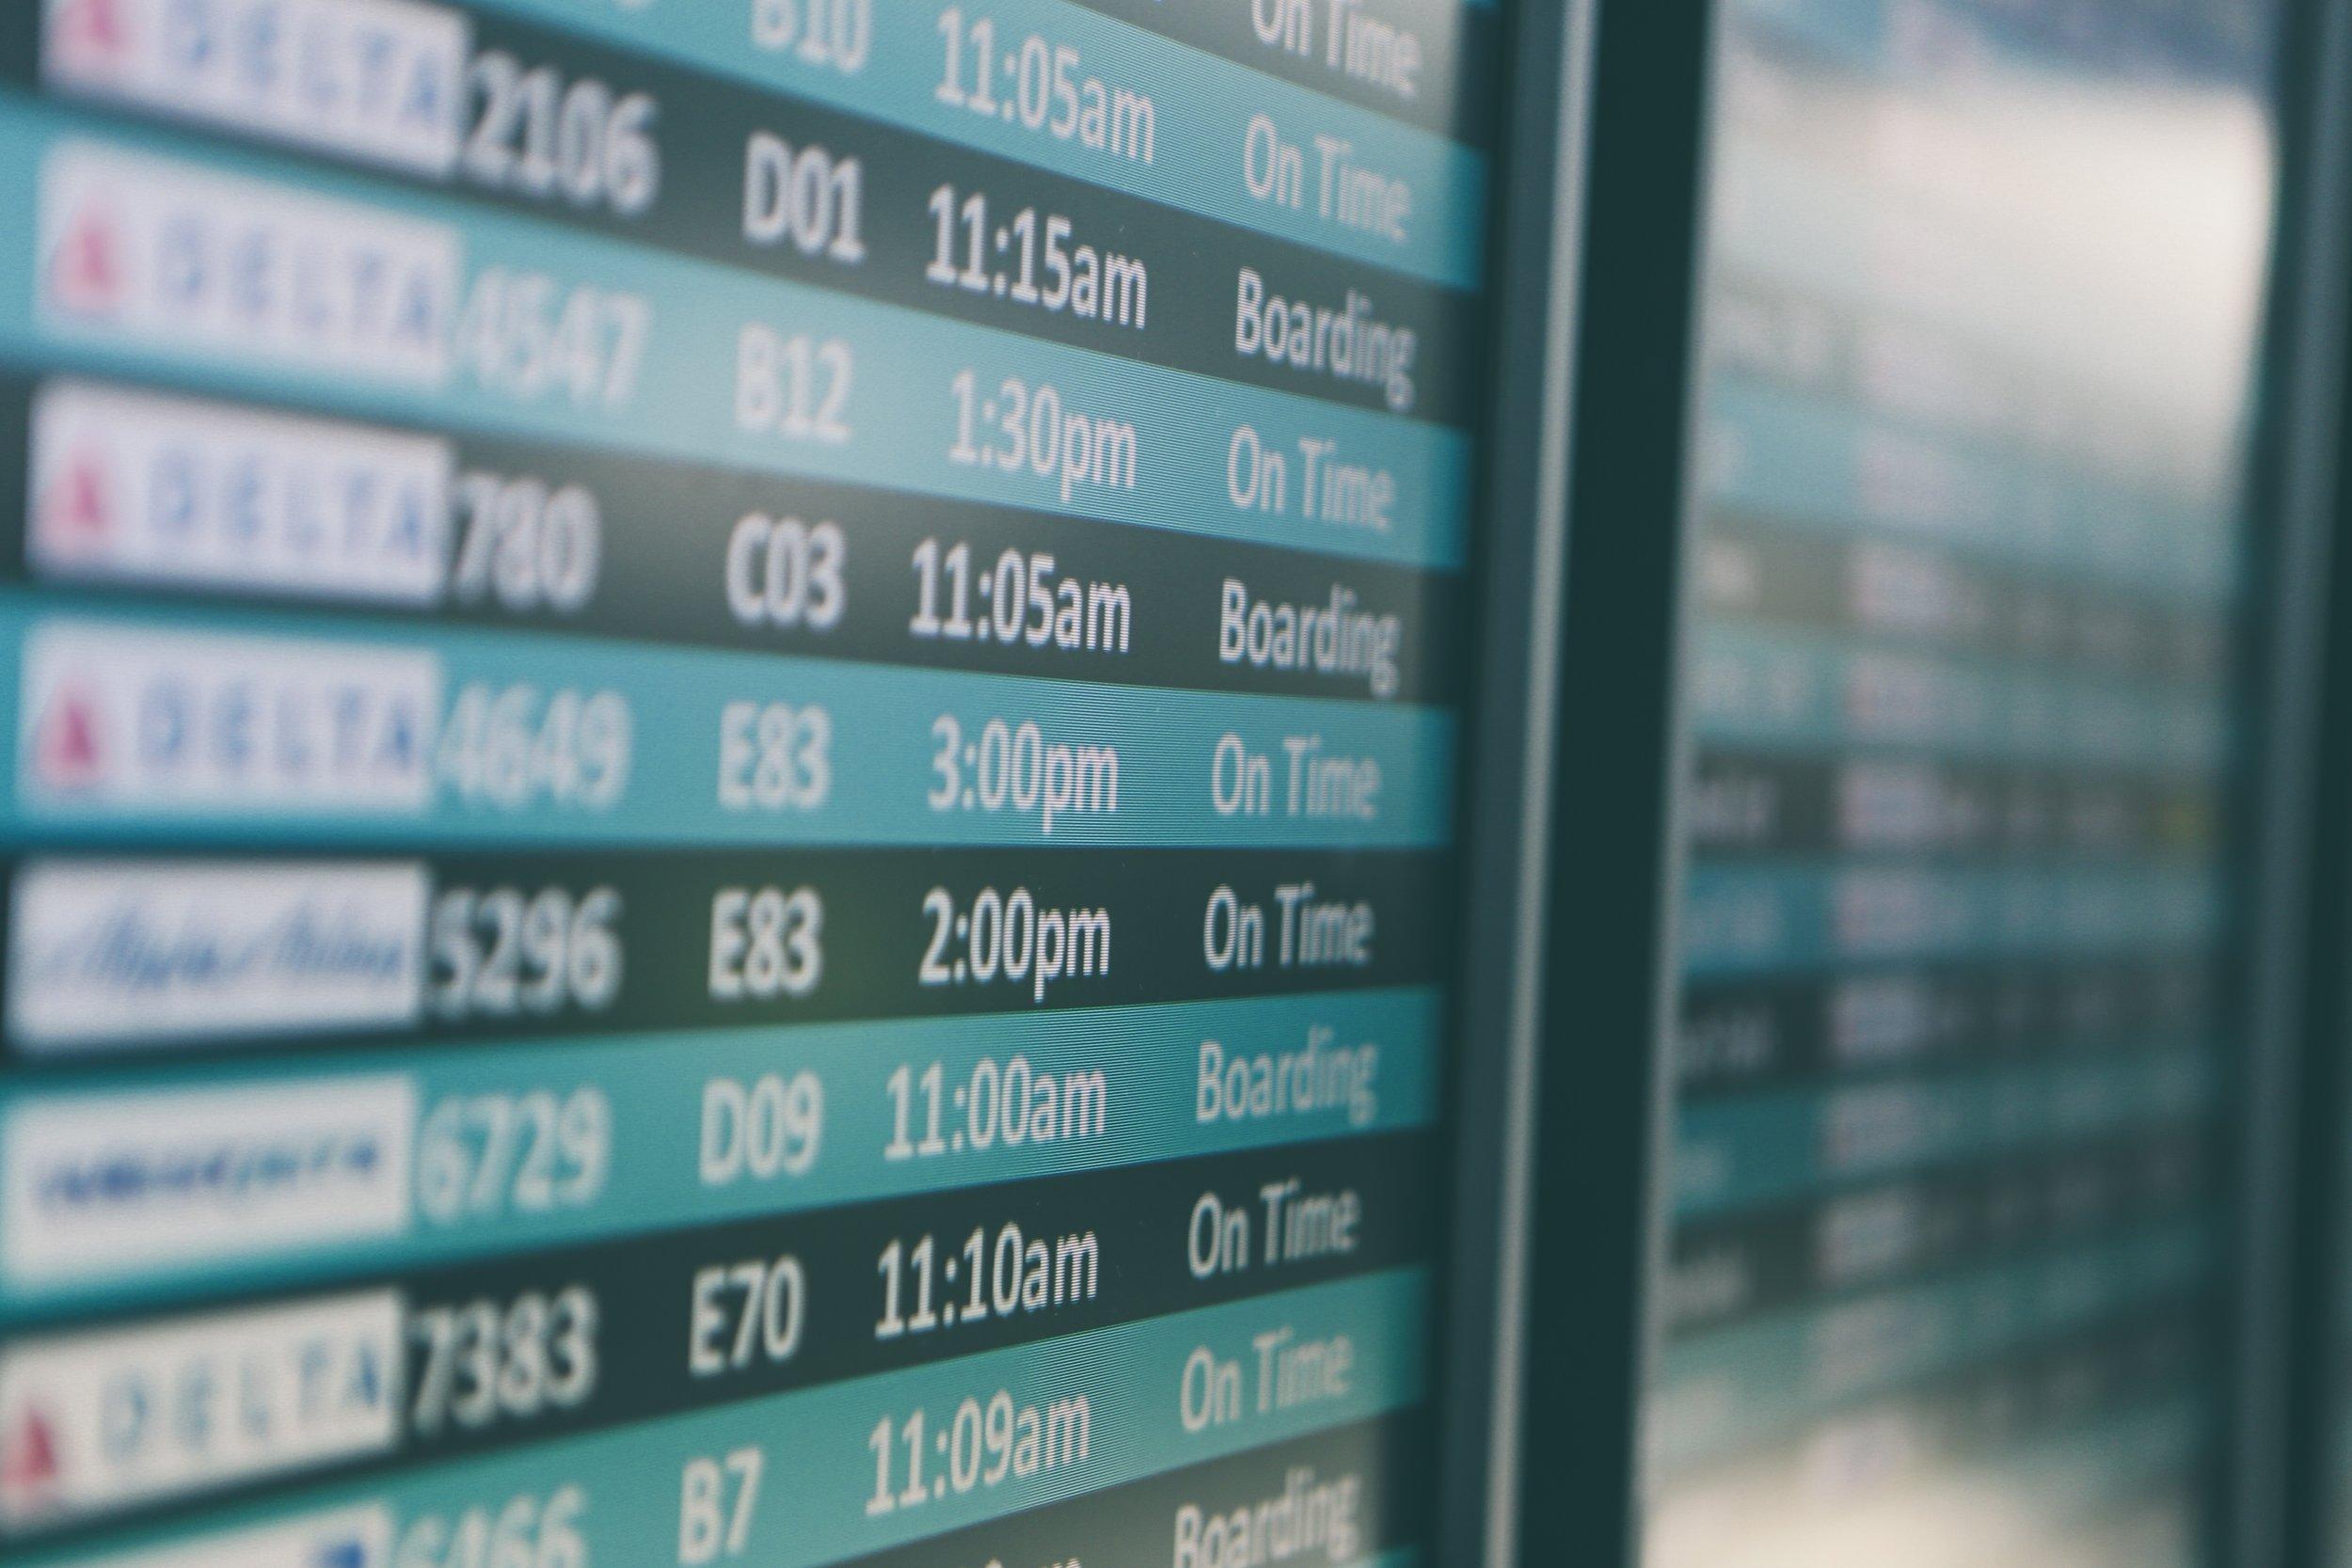 airport-departure-arrivals-board